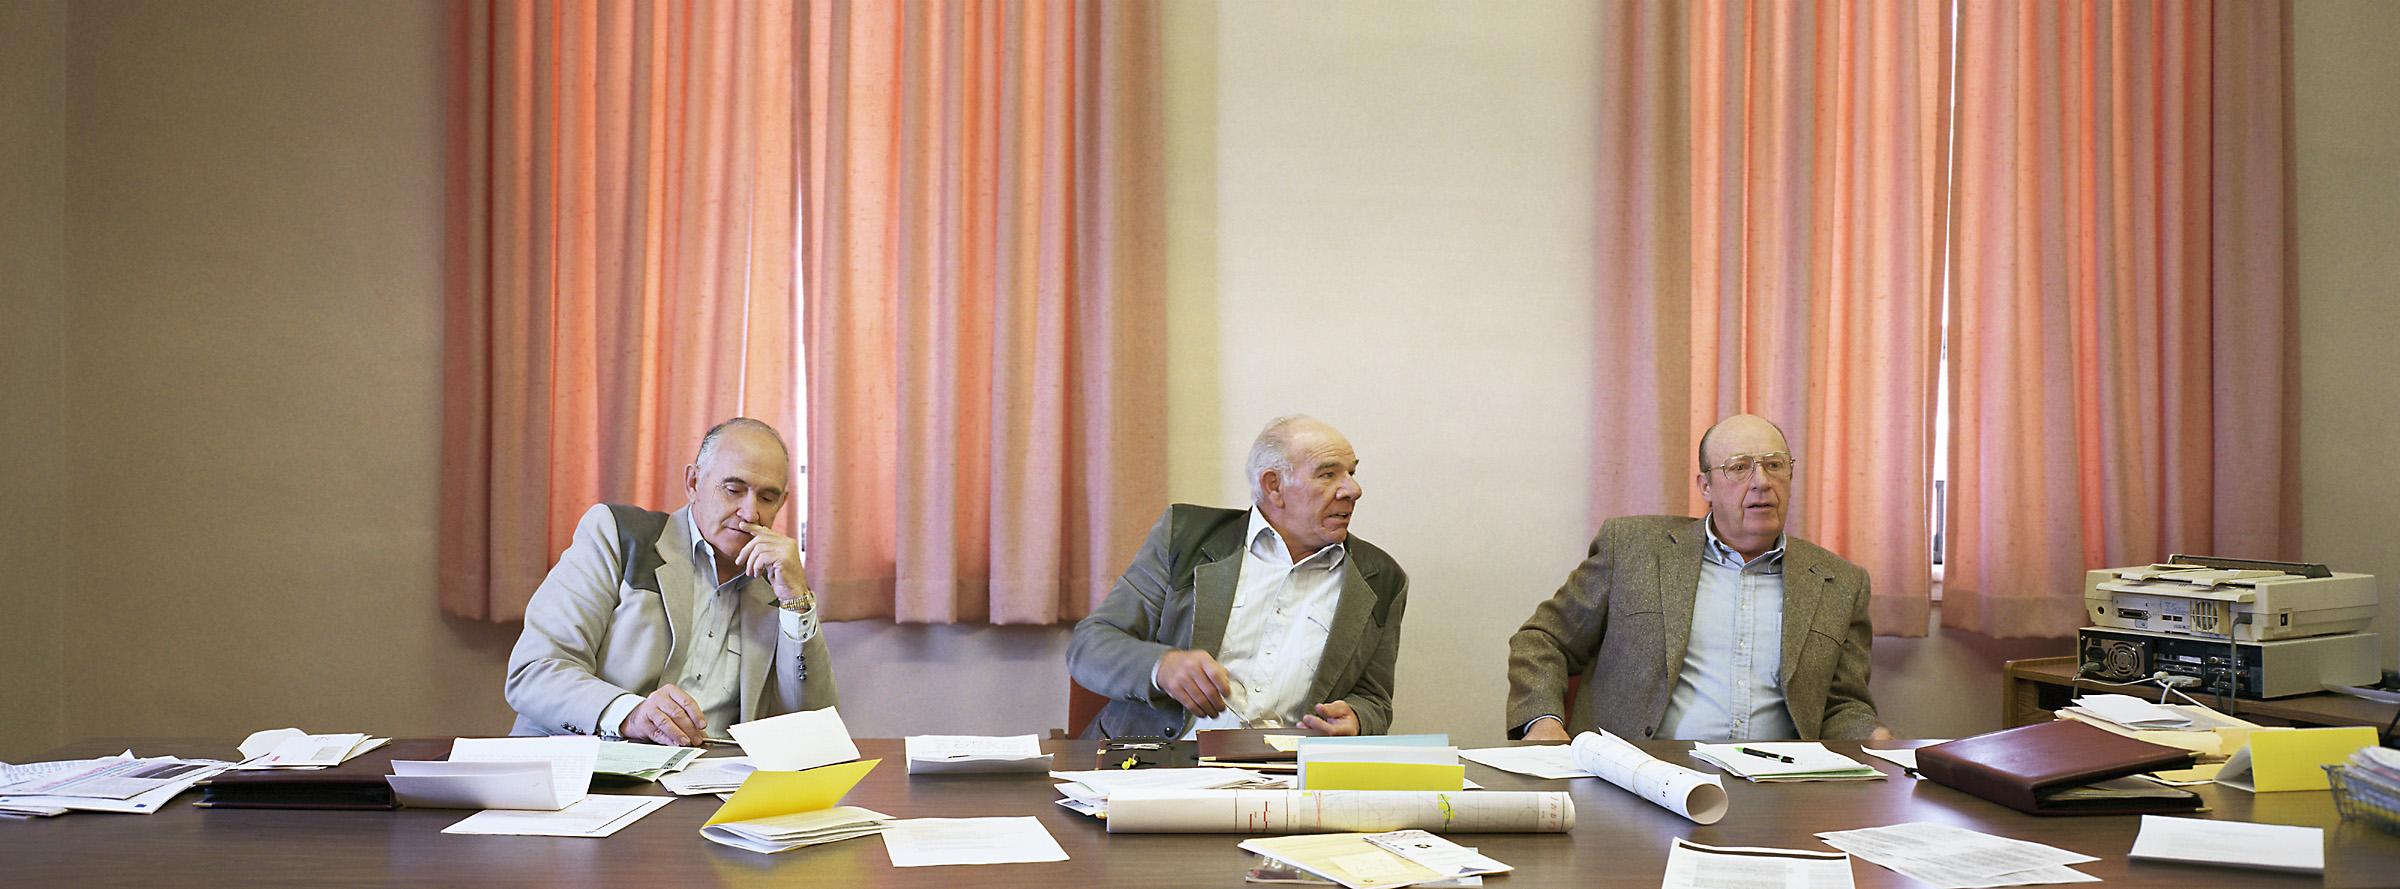 Wayne County, Utah (population 2,114) Board of Commissioners, April 5, 1999 (L to R): Scott Durfey, Clenn Okerlund (Chair), Stan Allen, 1999.